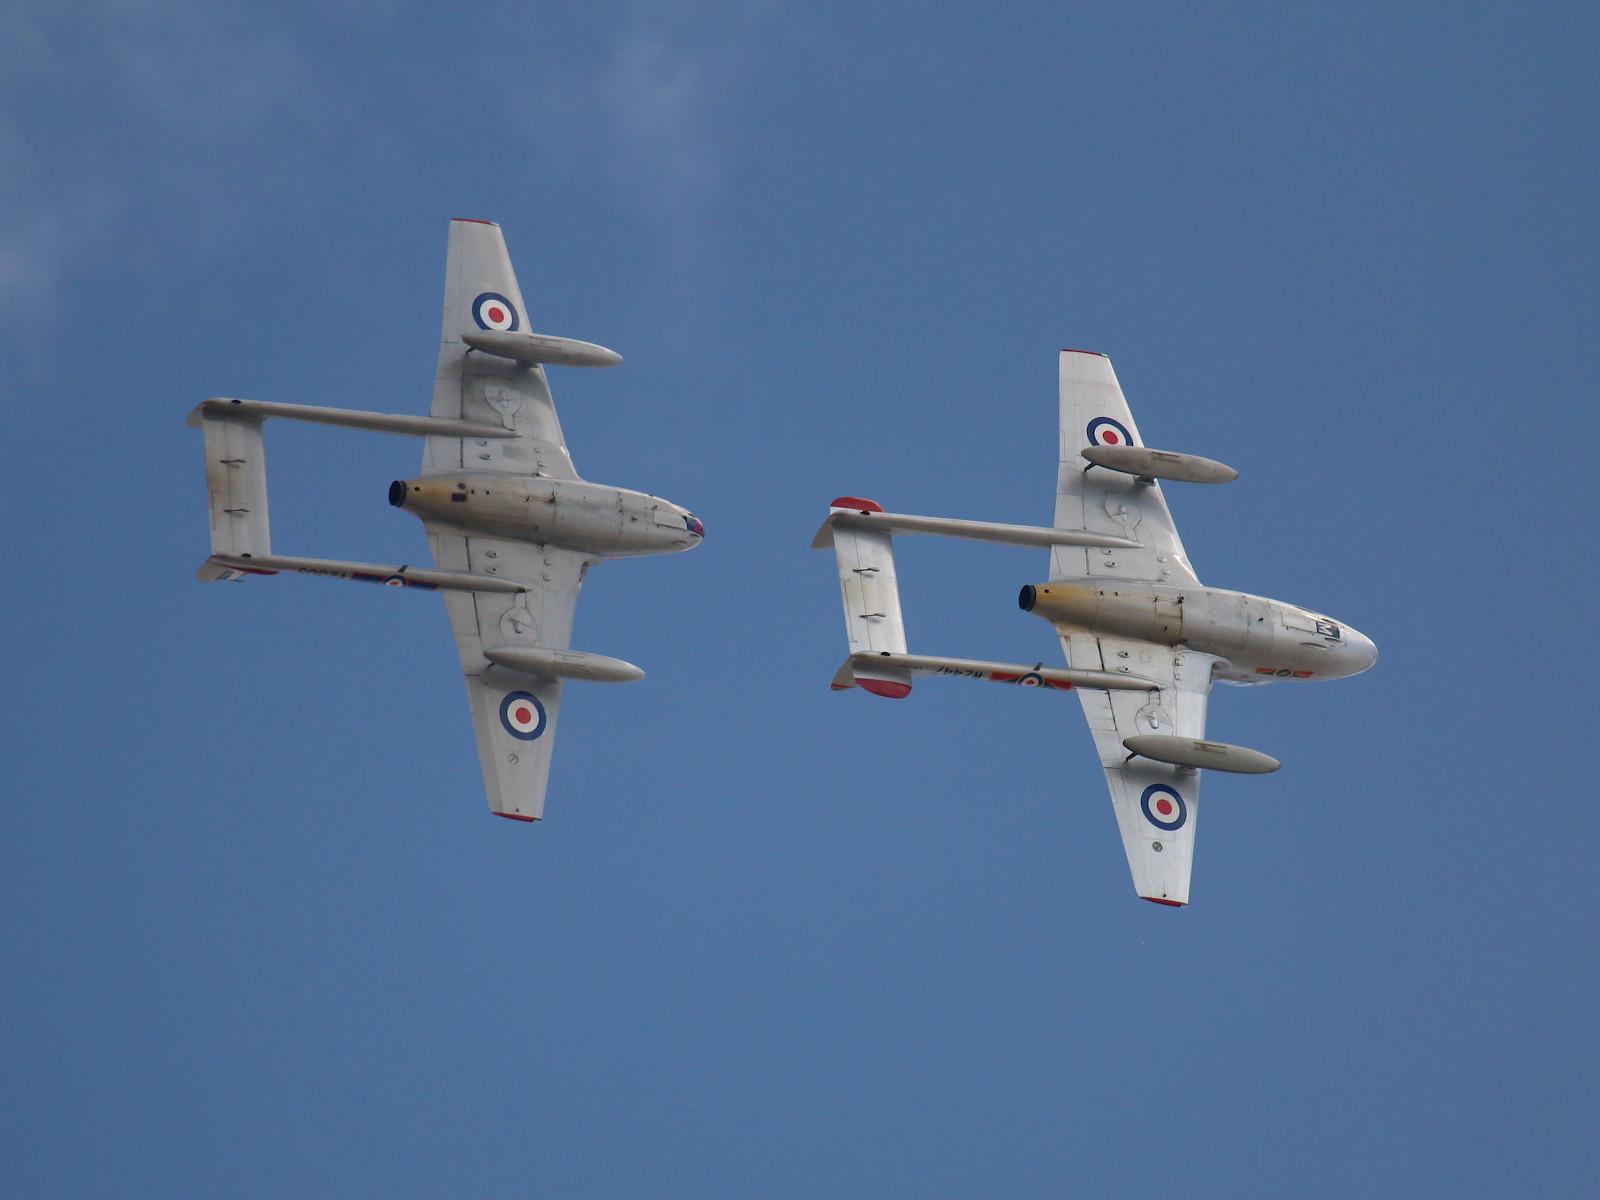 De Havilland Vampire T.55 LN-DHZ / WZ447 und Vampire FB-52 LN-DHY / VZ305/N © Doppeladler.com